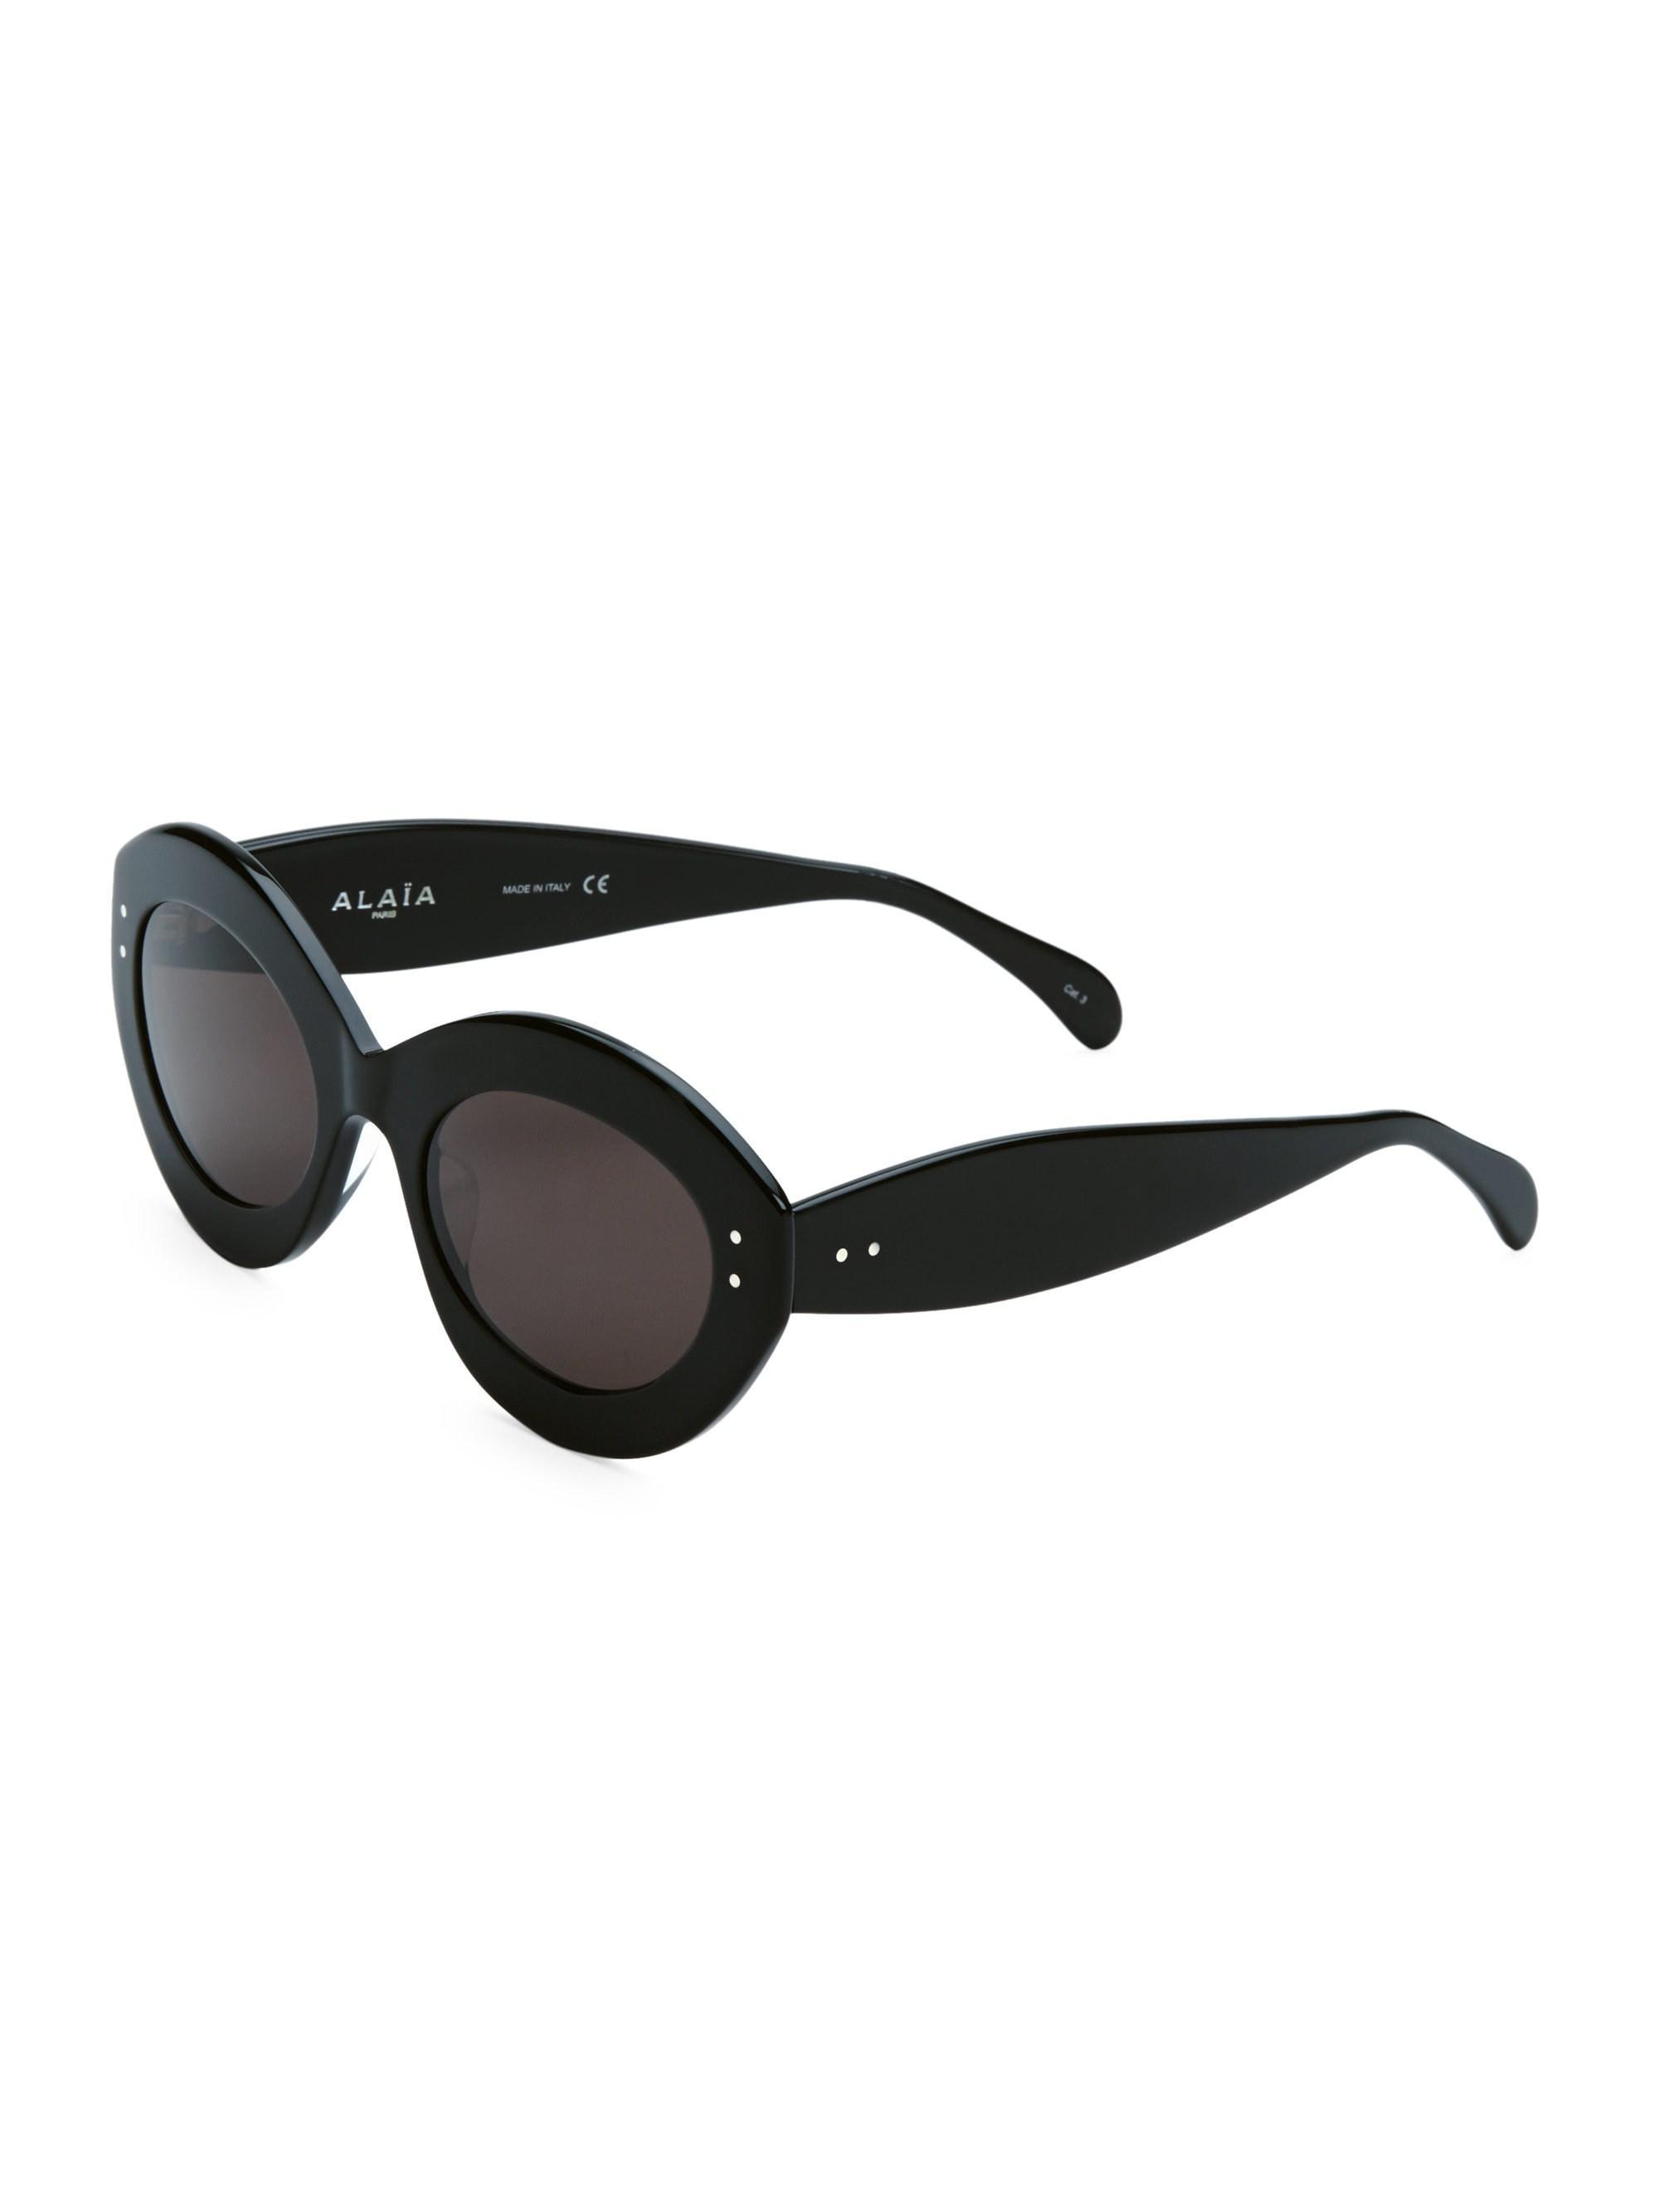 032b5a1829 Lyst - Alaïa Enhanced Femininity Black Oval Sunglasses in Black